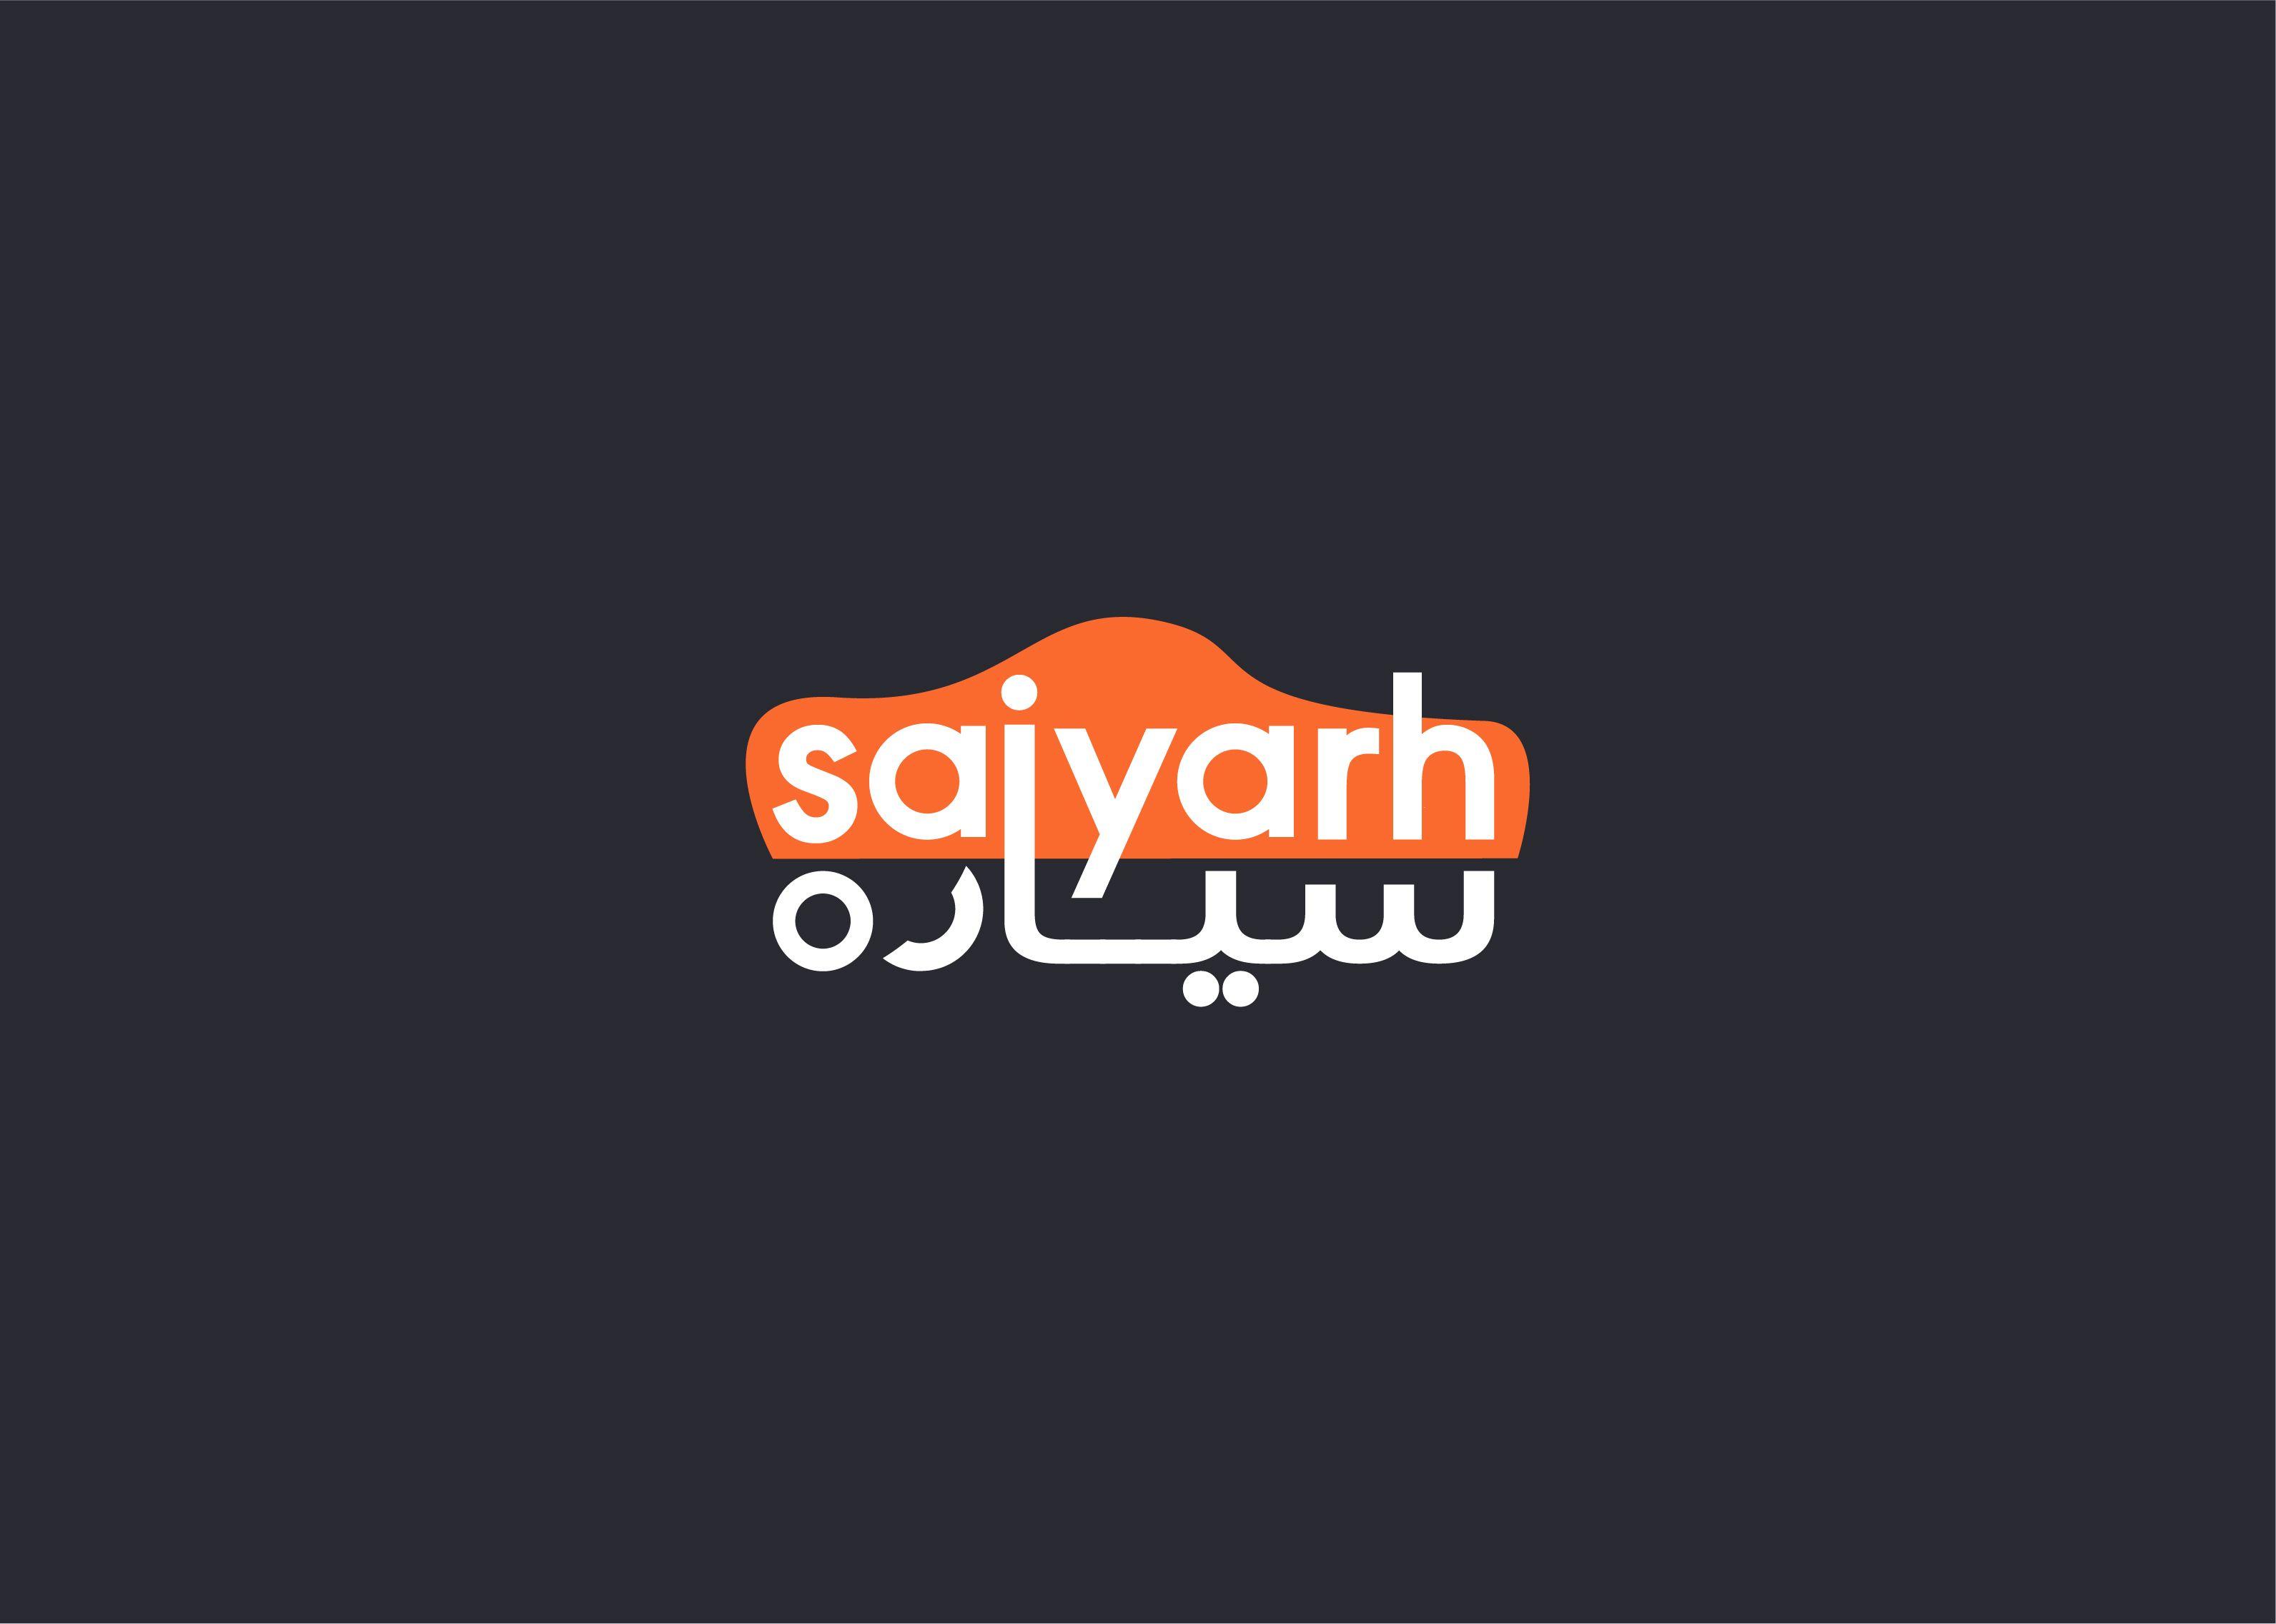 Saiyarh Logo Design For Online Car Rental Service Online Car Rental Logo Design Online Cars